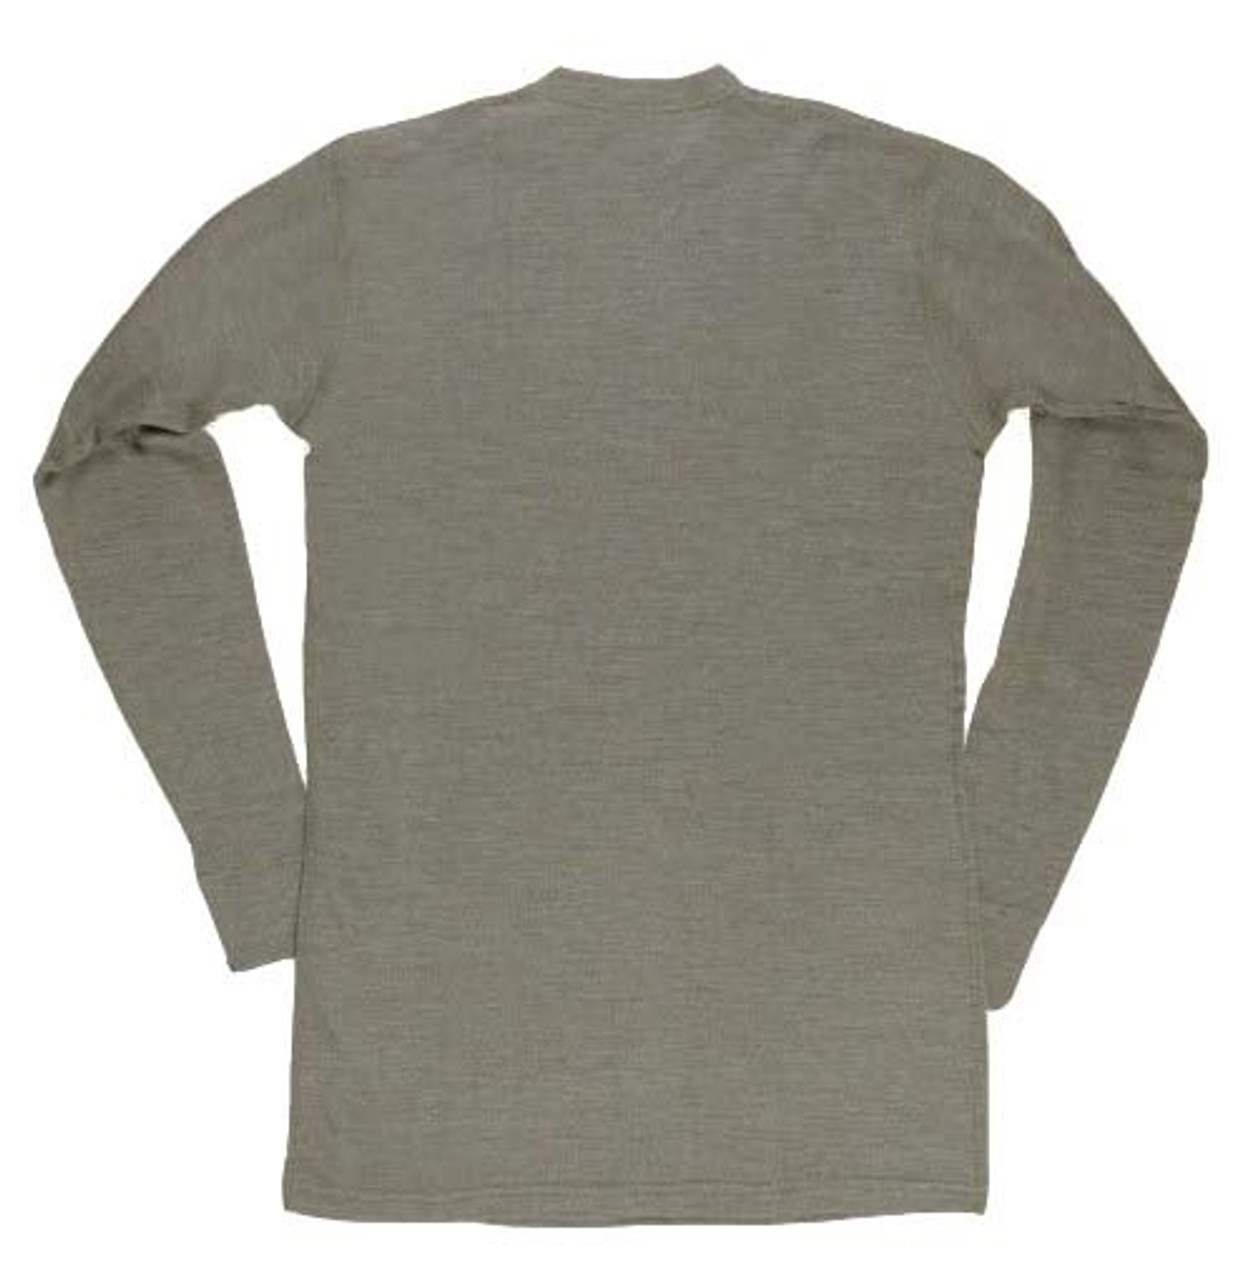 Belgium Army Aramid OD Long Sleeve Undershirt from Hessen Antique